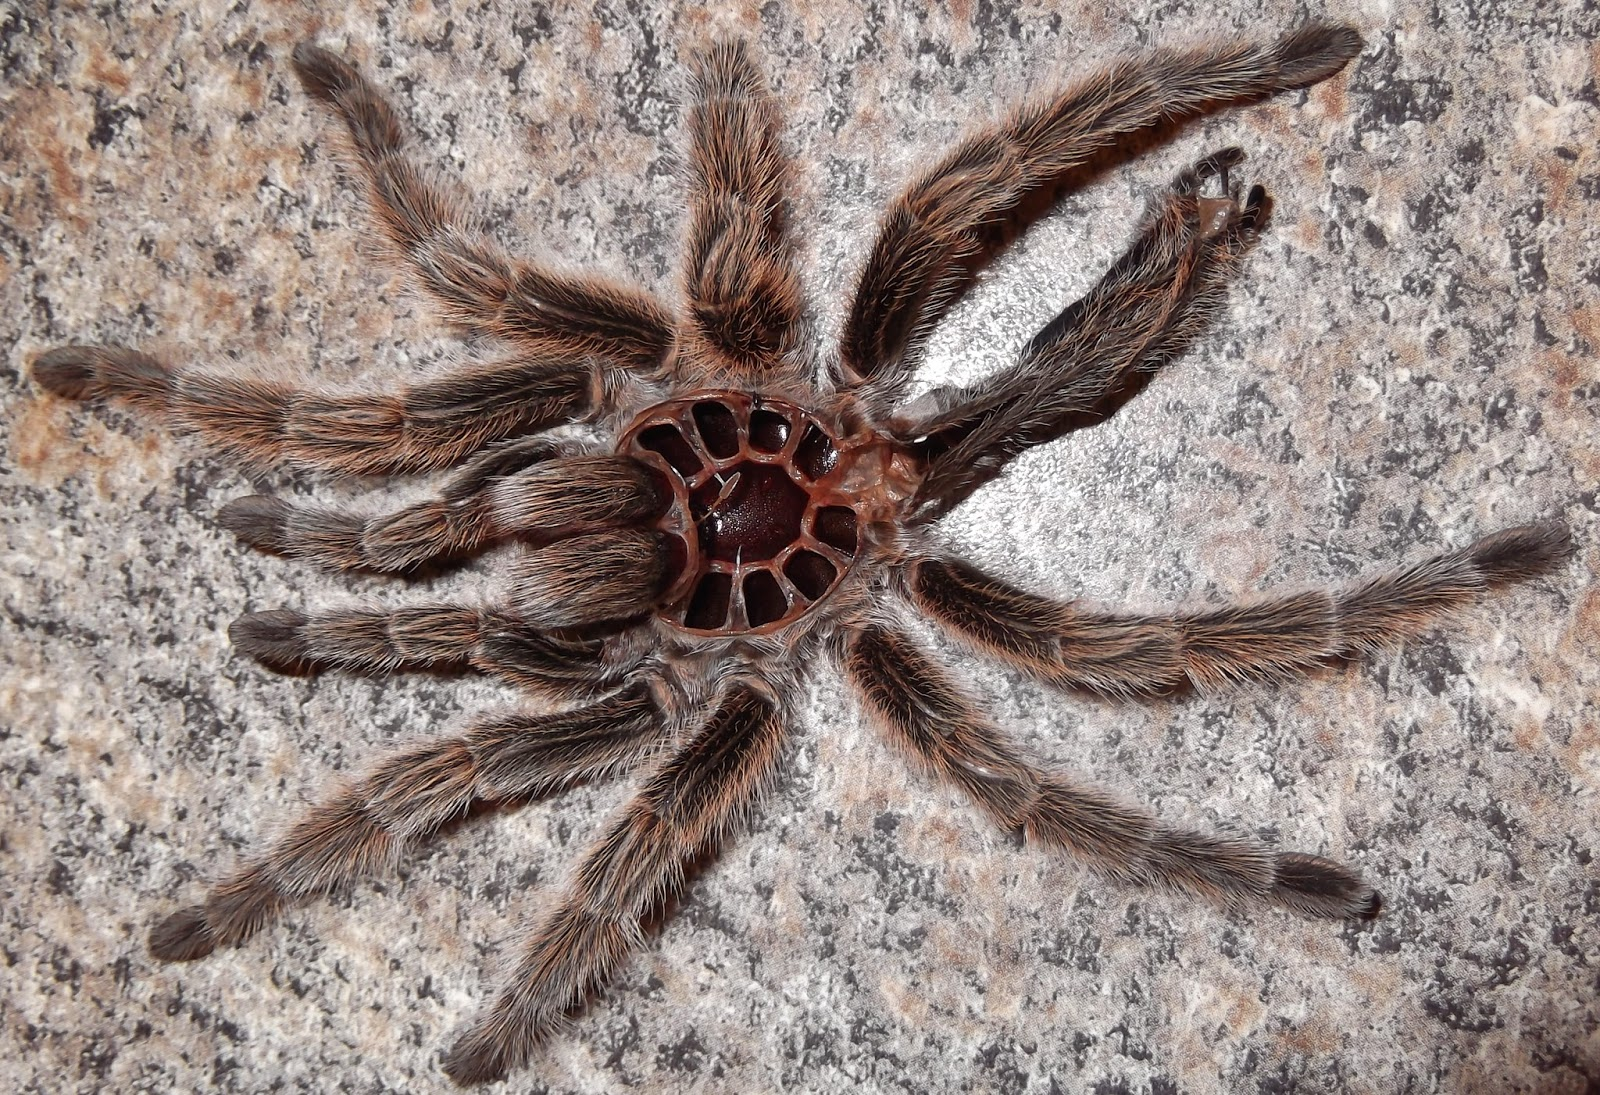 Chilean Rose Tarantula Molting